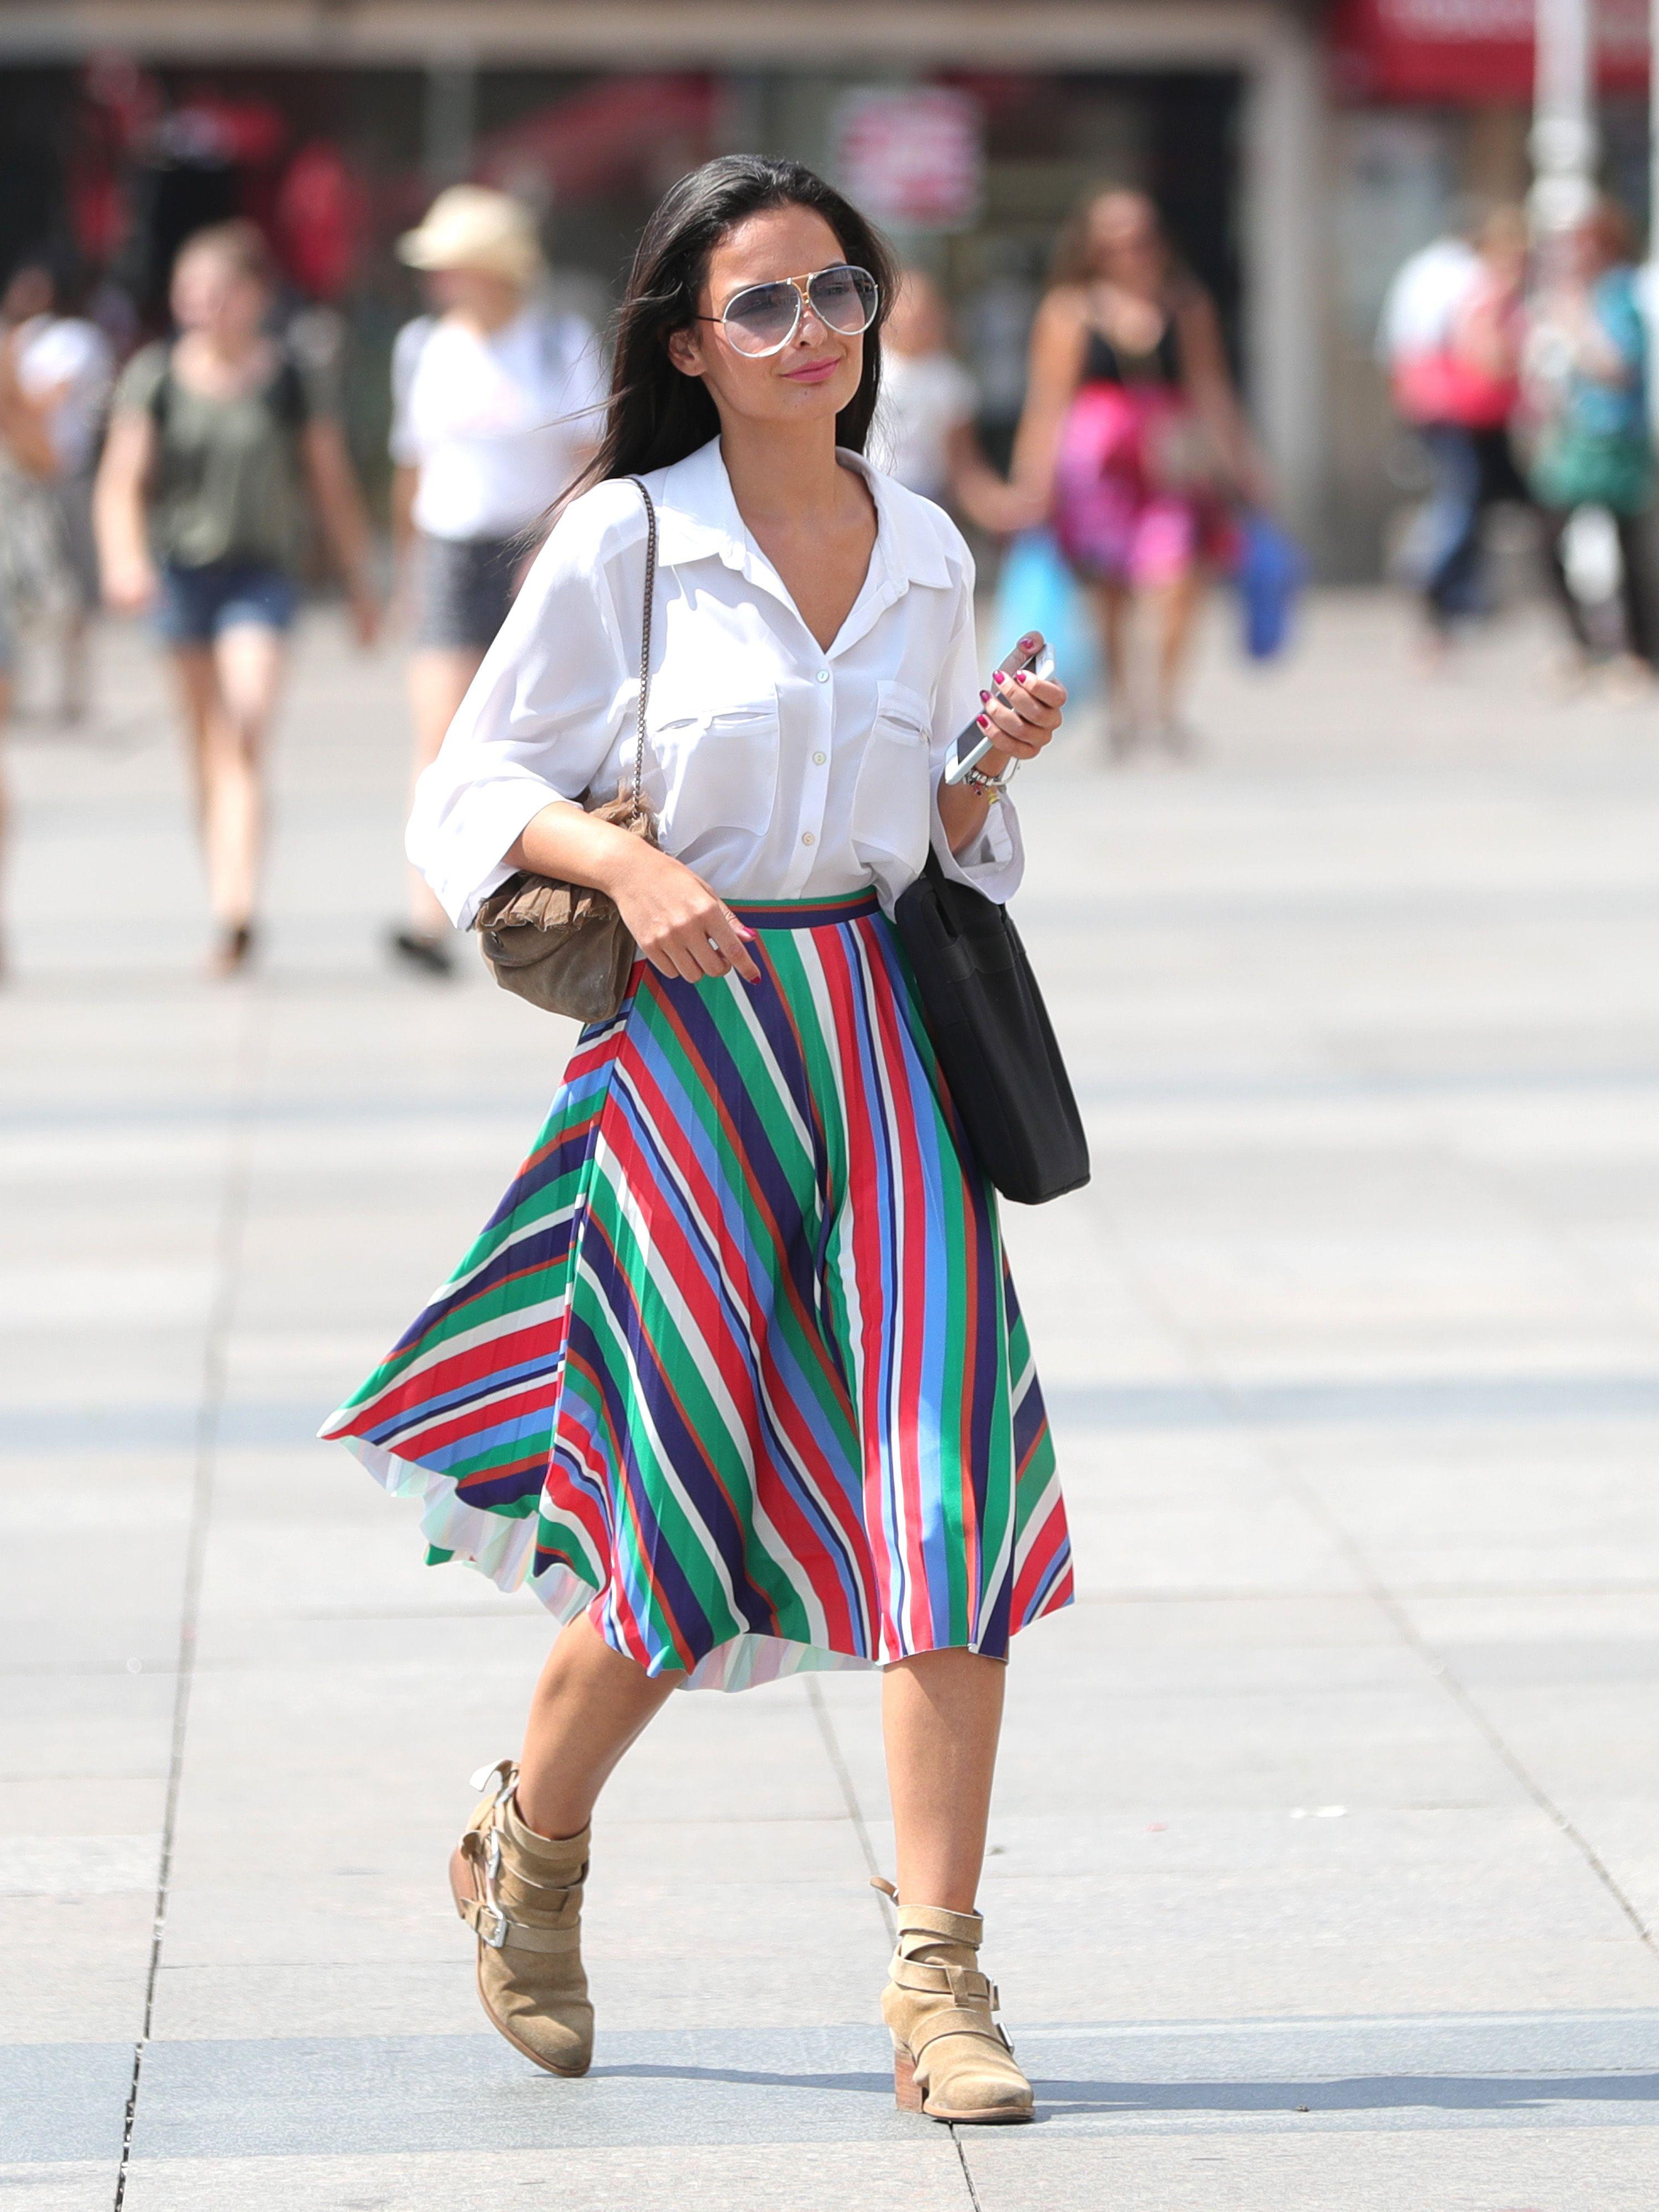 Atraktivna crnka na glavnom zagrebačkom Trgu zablistala u fantastičnom stylingu